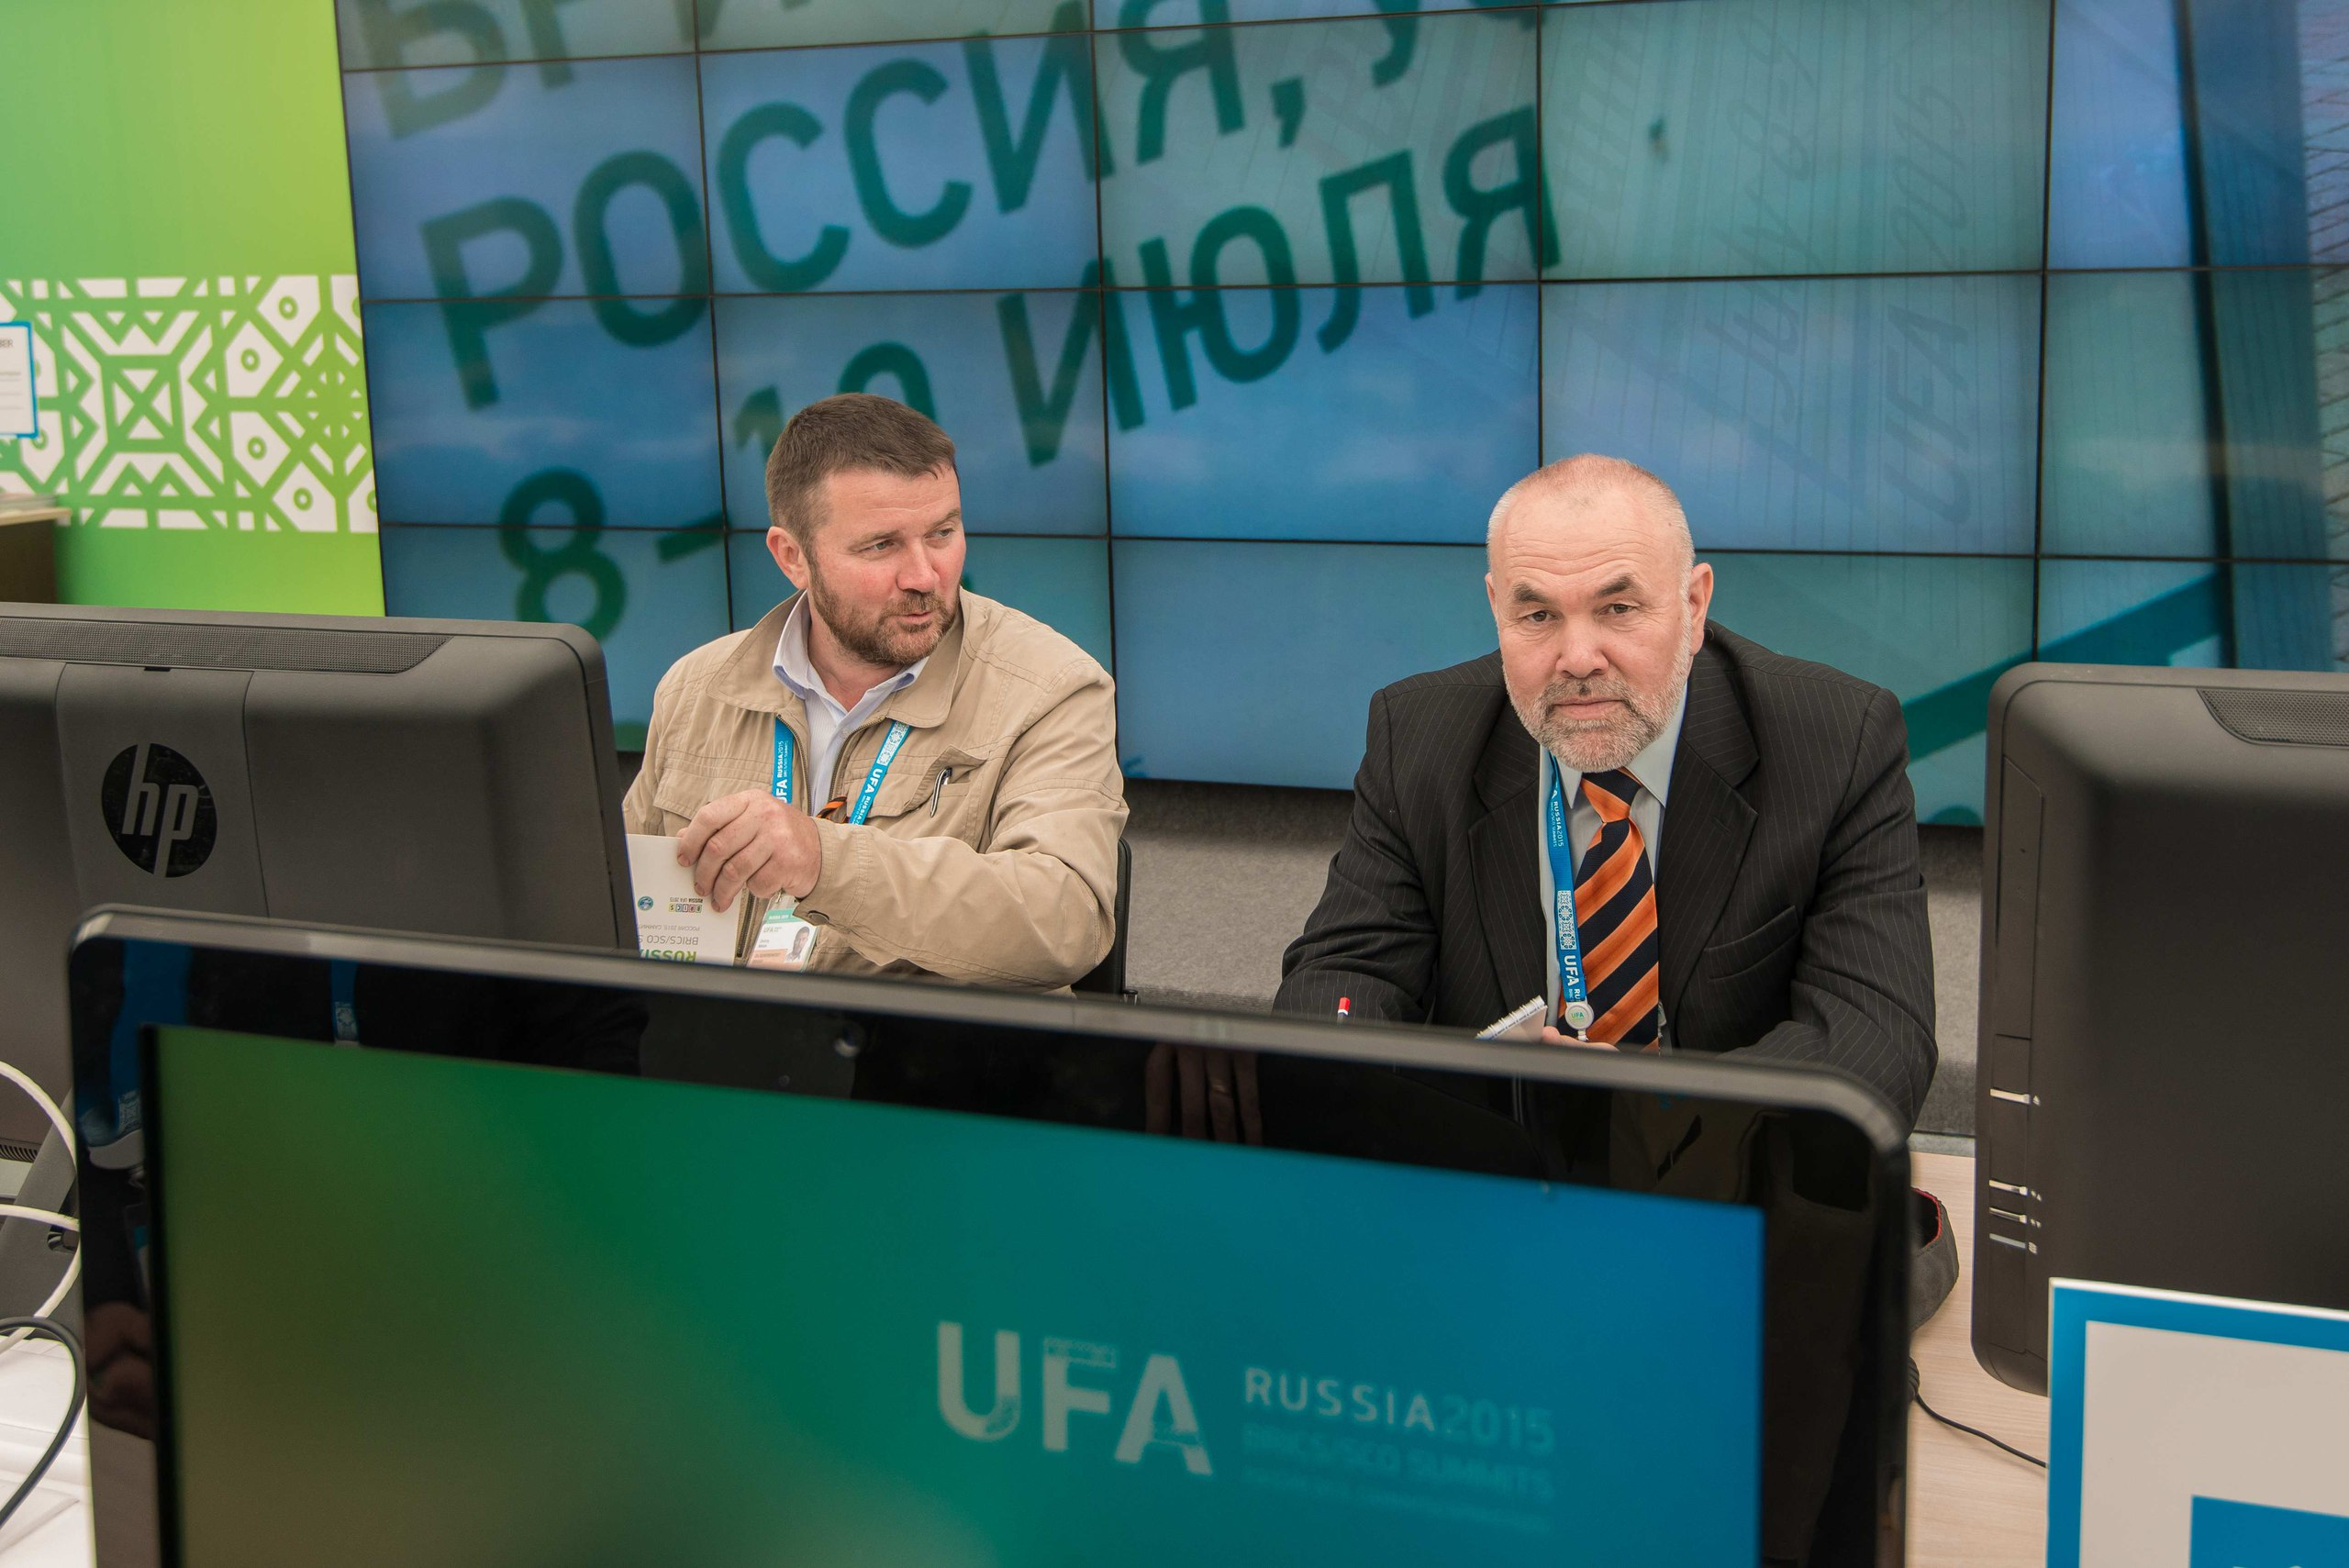 Как корреспондентов НОД лишили аккредитации на саммите БРИКС в Уфе